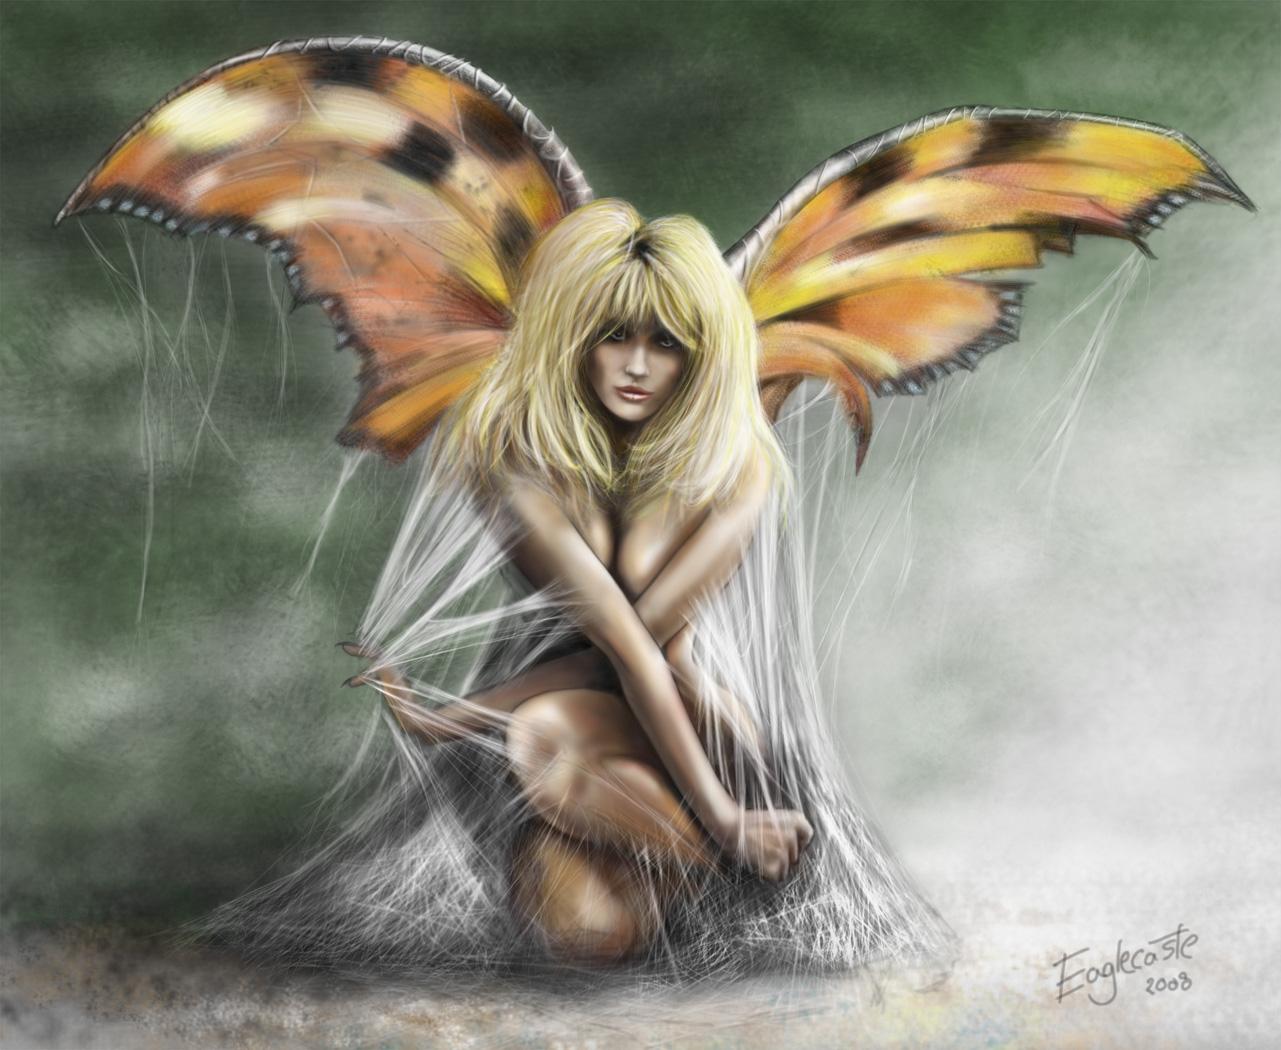 Kym's Random Thoughts: Human Metamorphosis